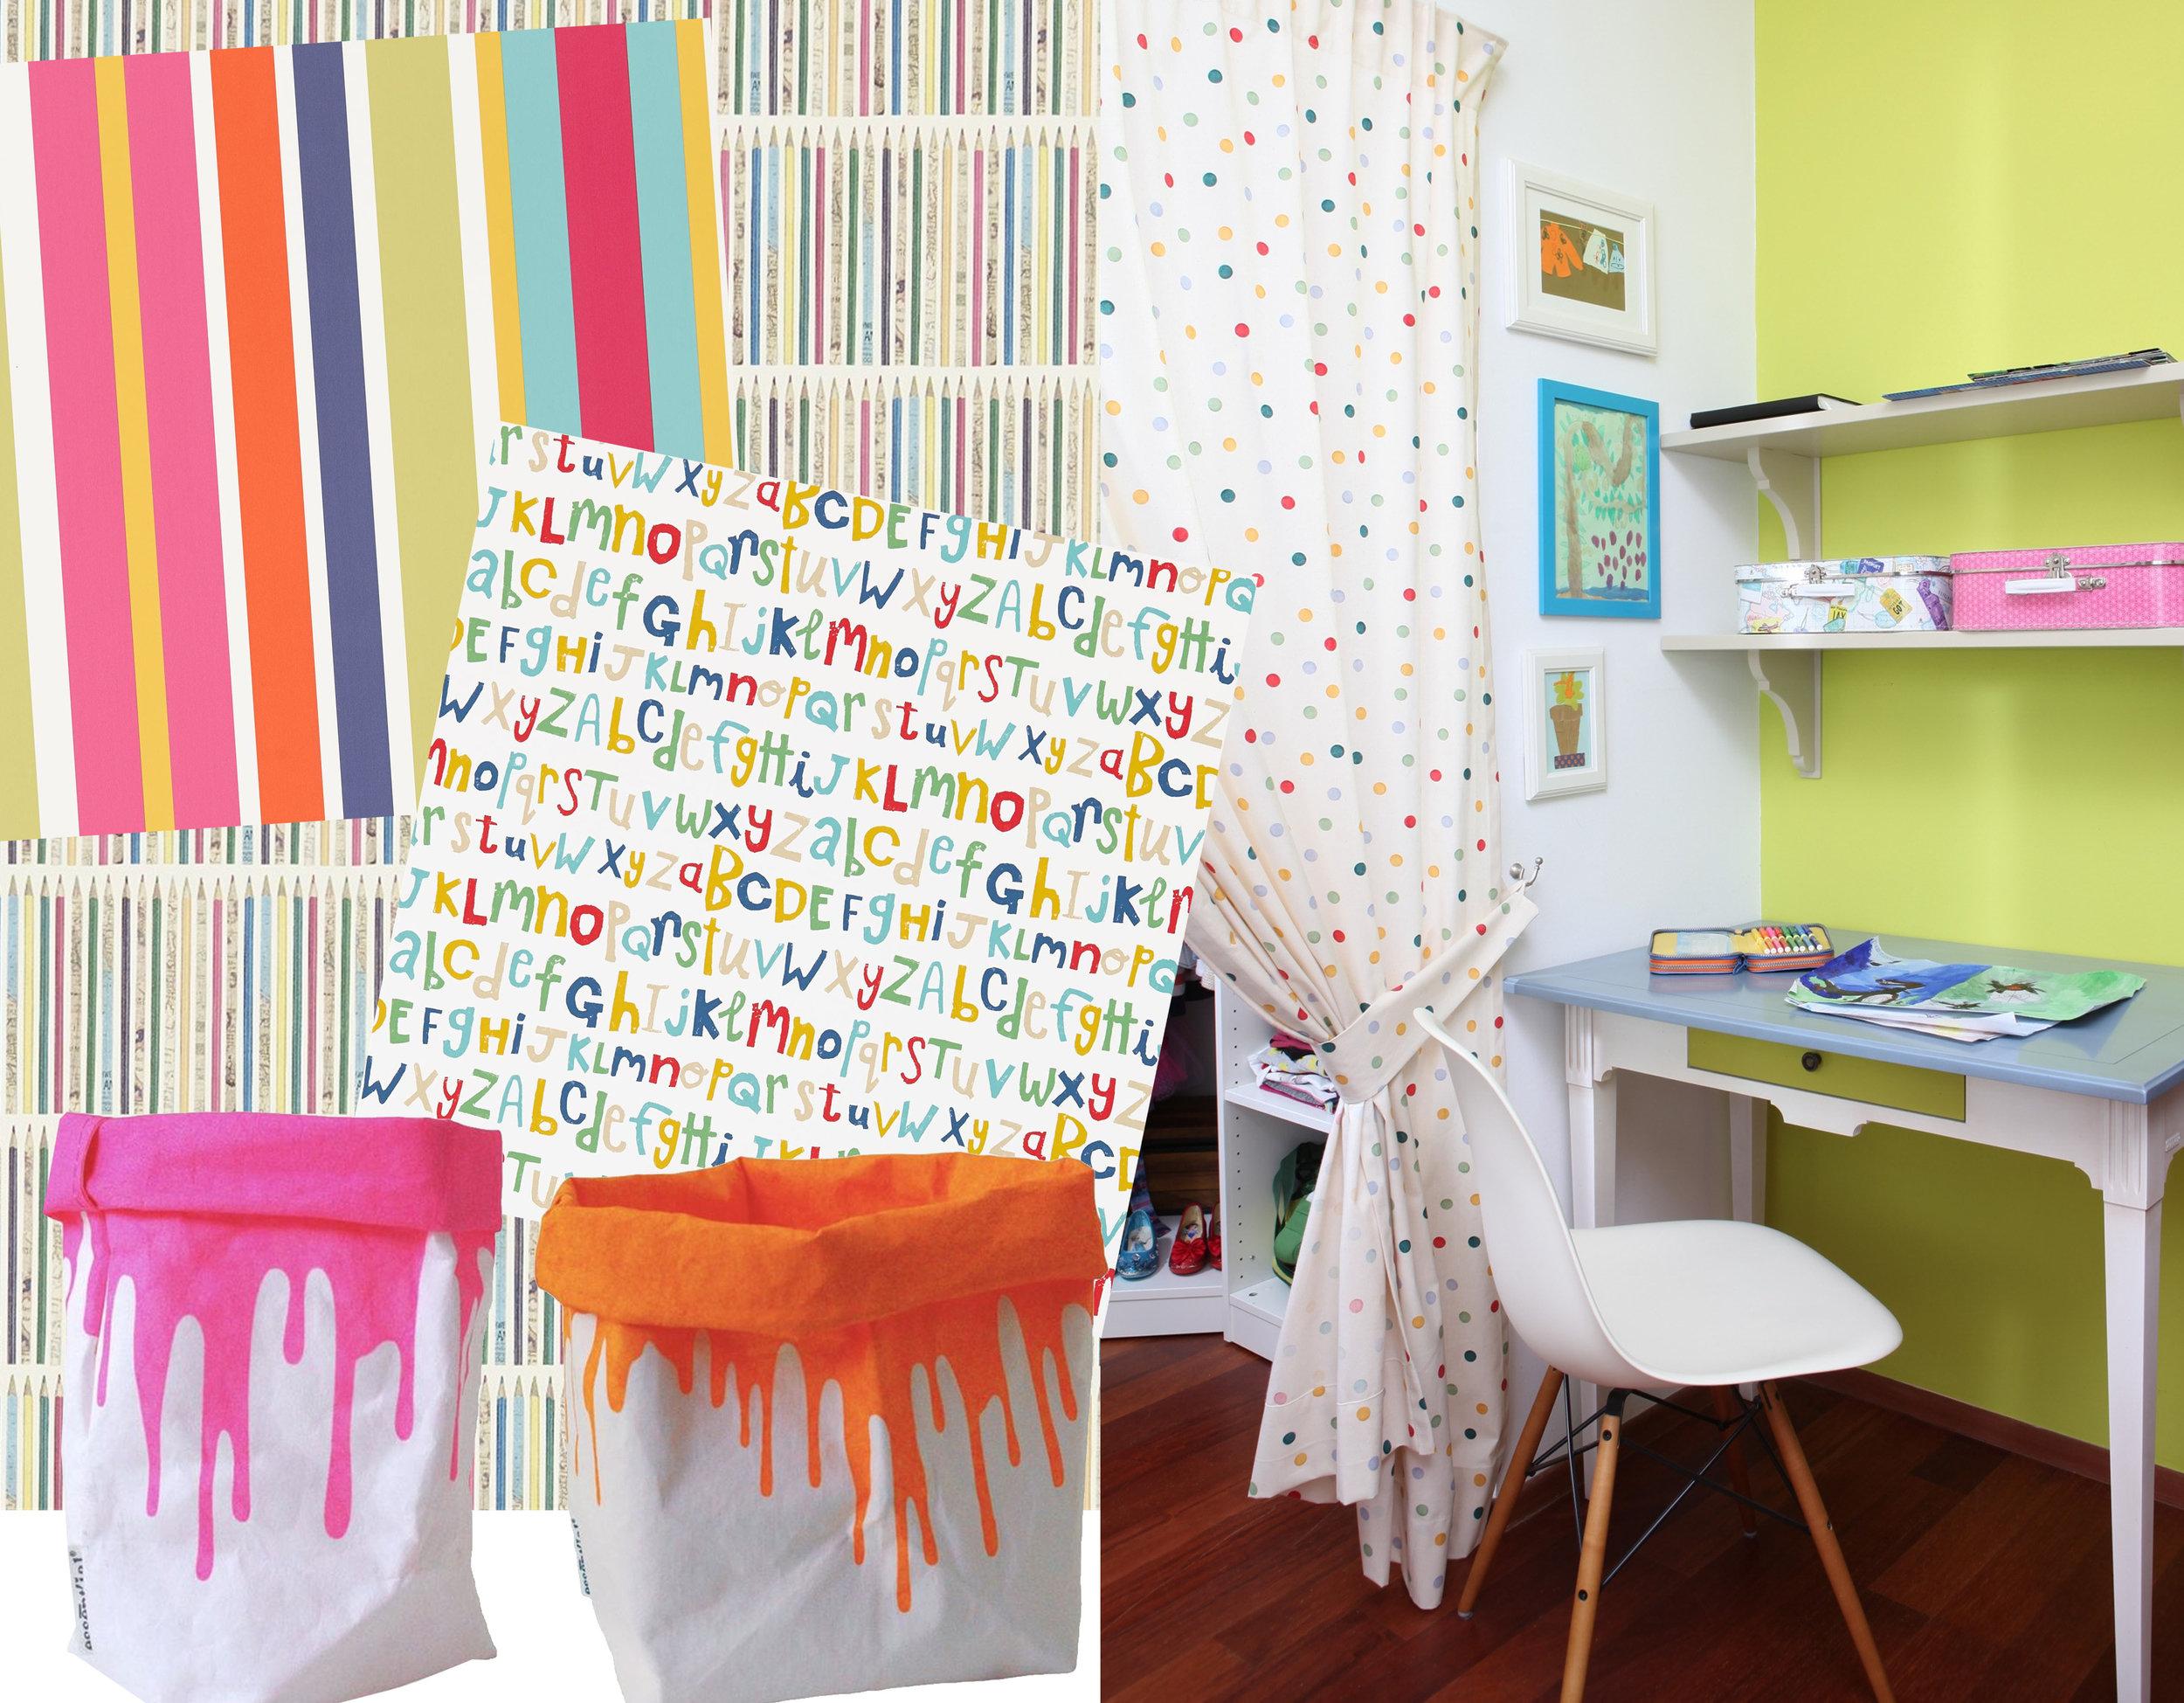 wallpaper  Sanderson  -  Scion - storage bags  Essentialist  - image Sorin Jacob for  Casa Lux  -  project  Primaverii 2015